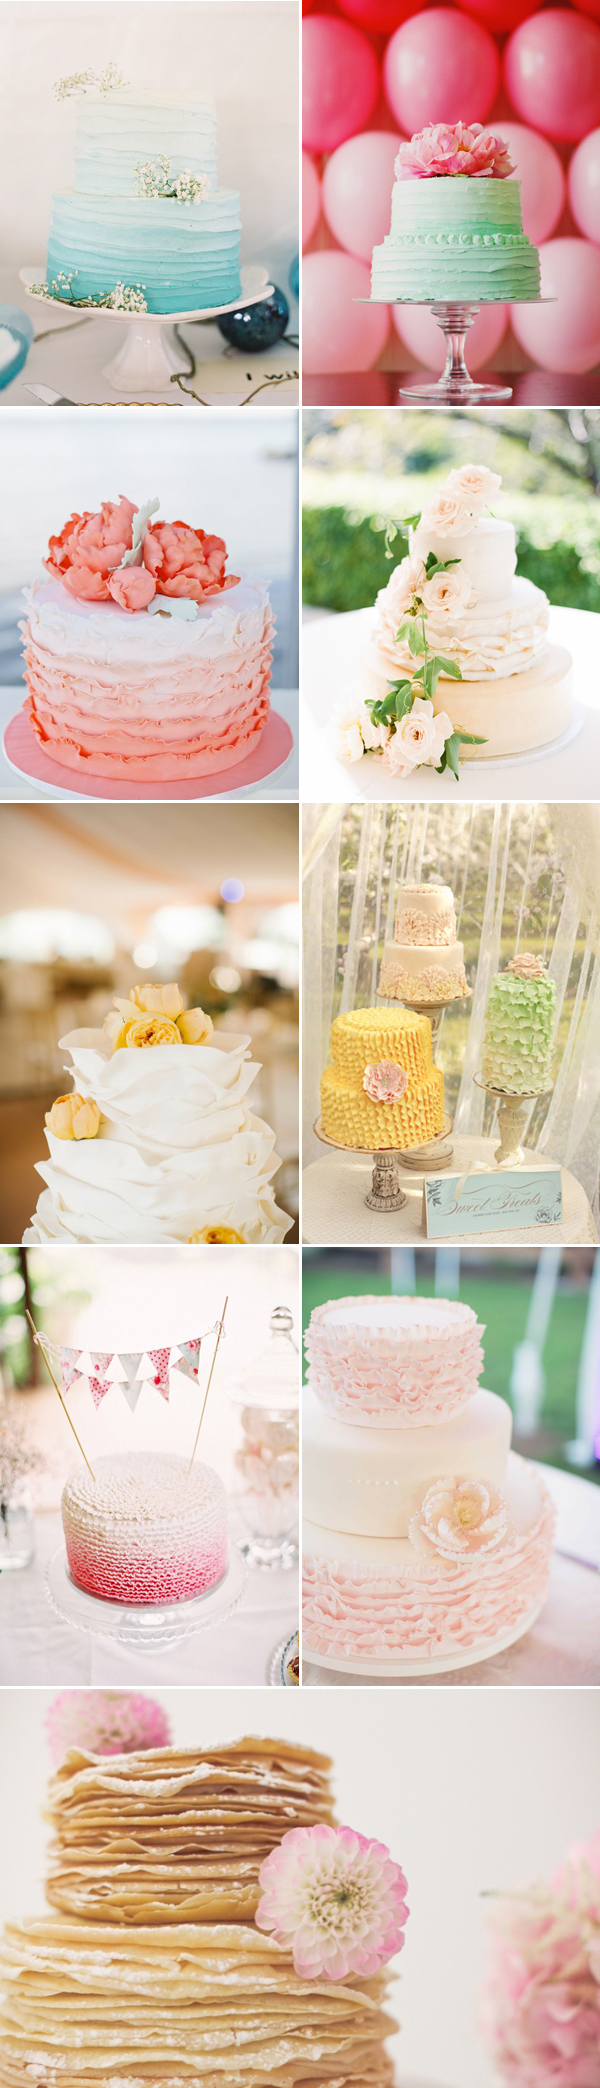 ruffle03-cake